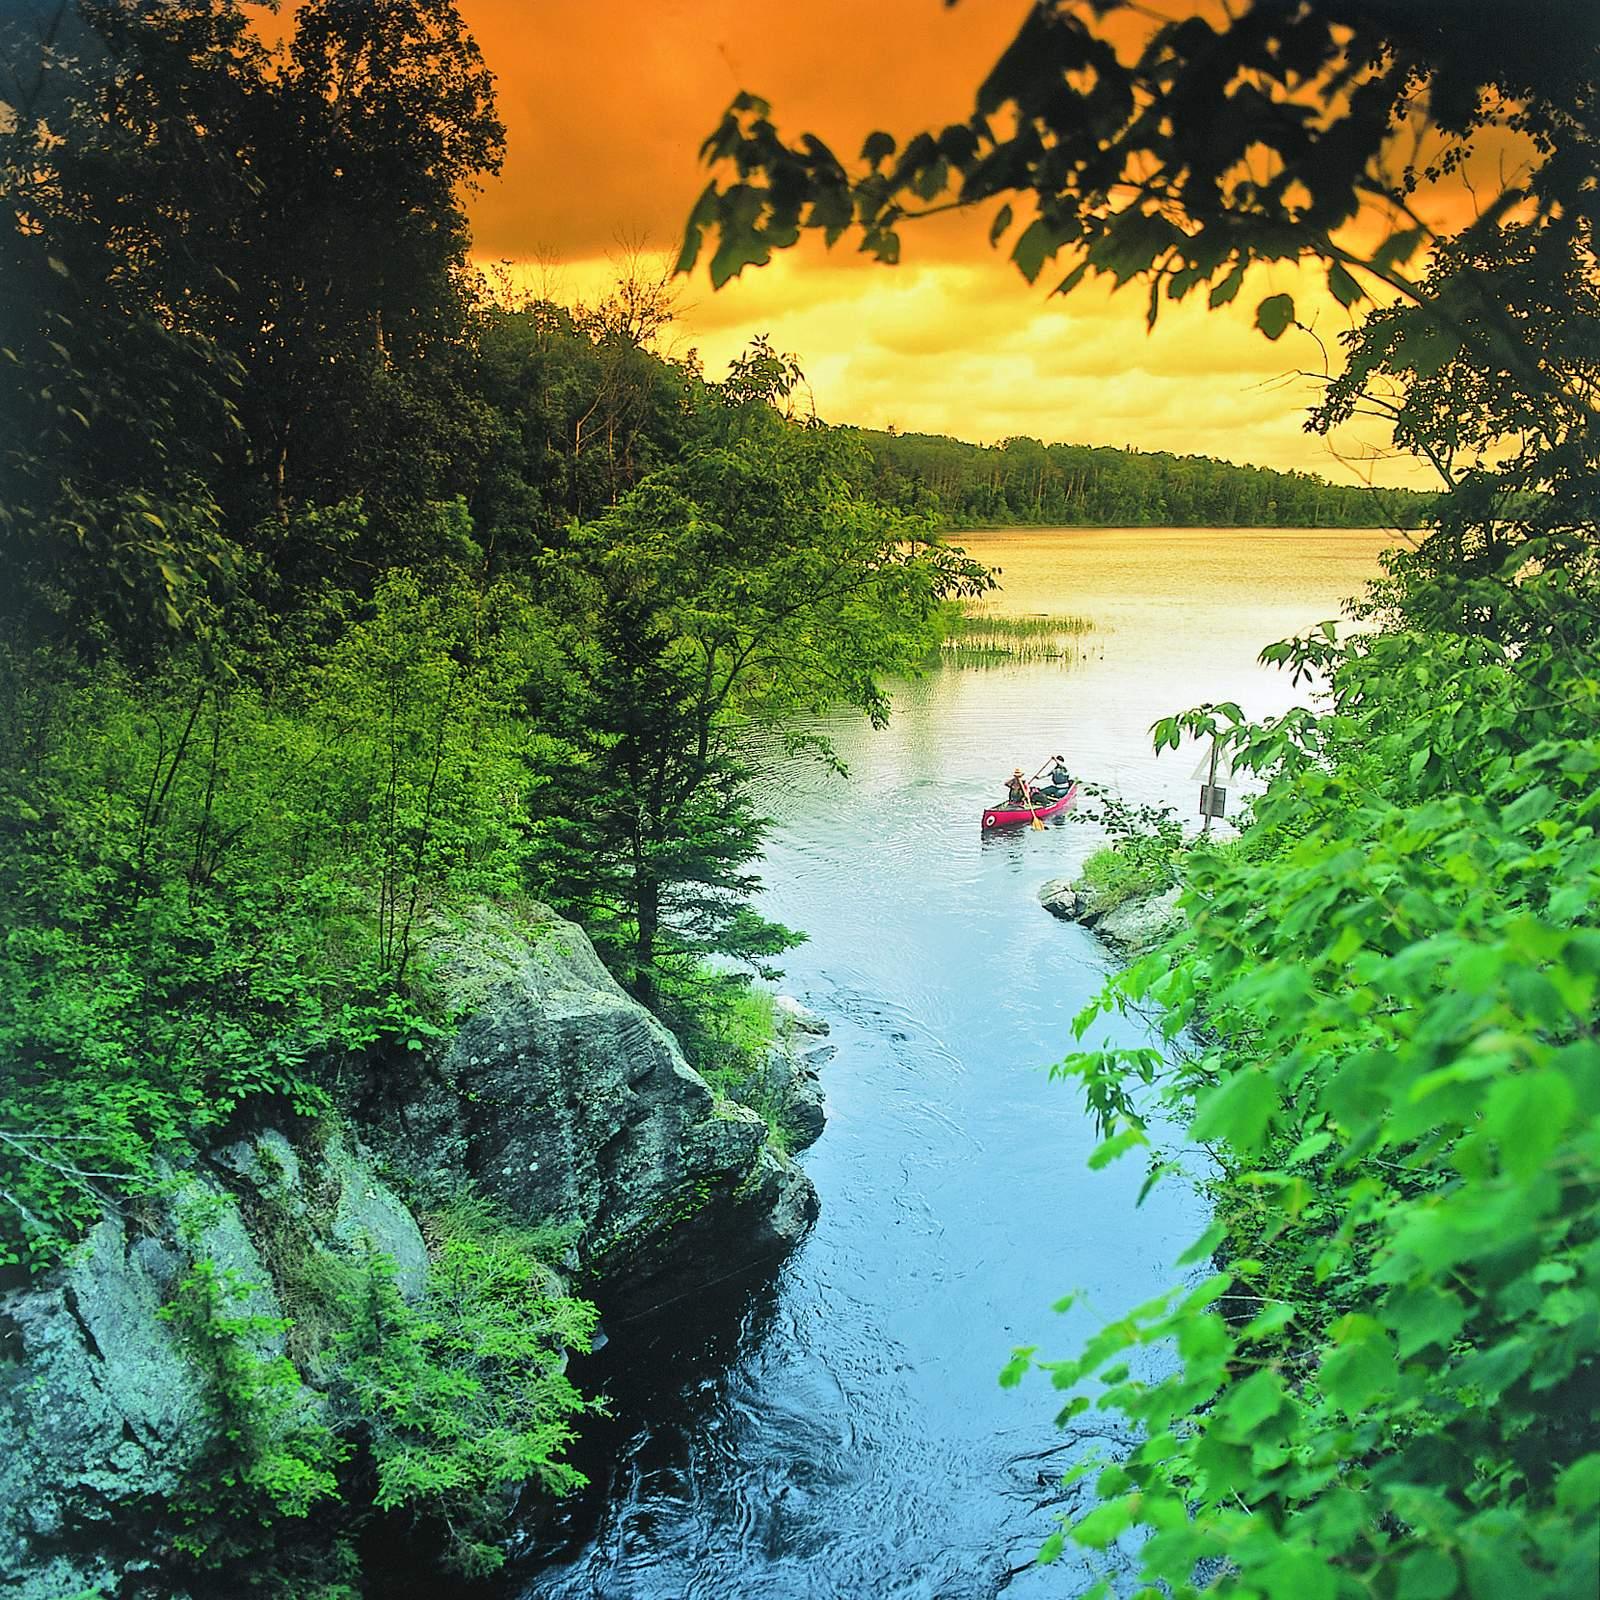 Kanutour am Caddy Lake